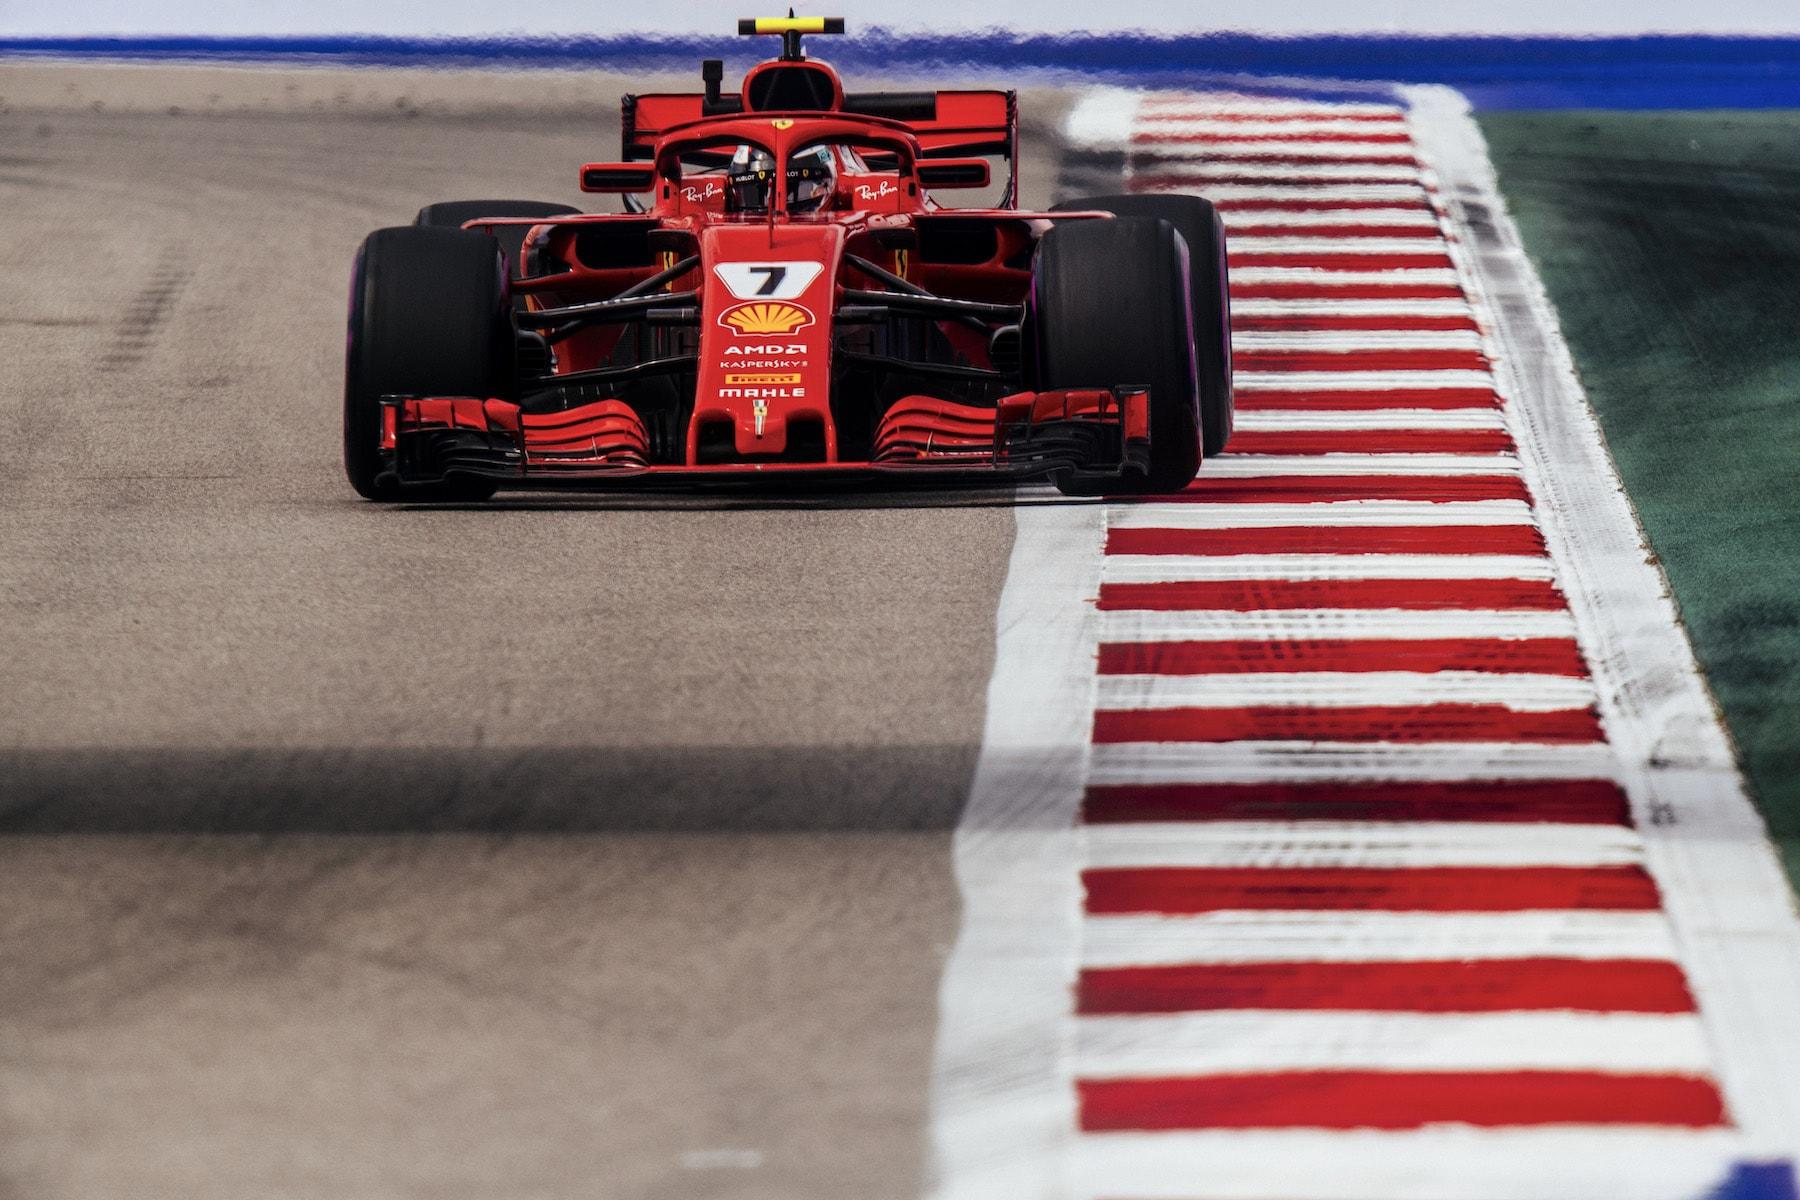 2018 Kimi Raikkonen | Ferrari SF71H | 2018 Russian GP FP2 1 copy.jpg